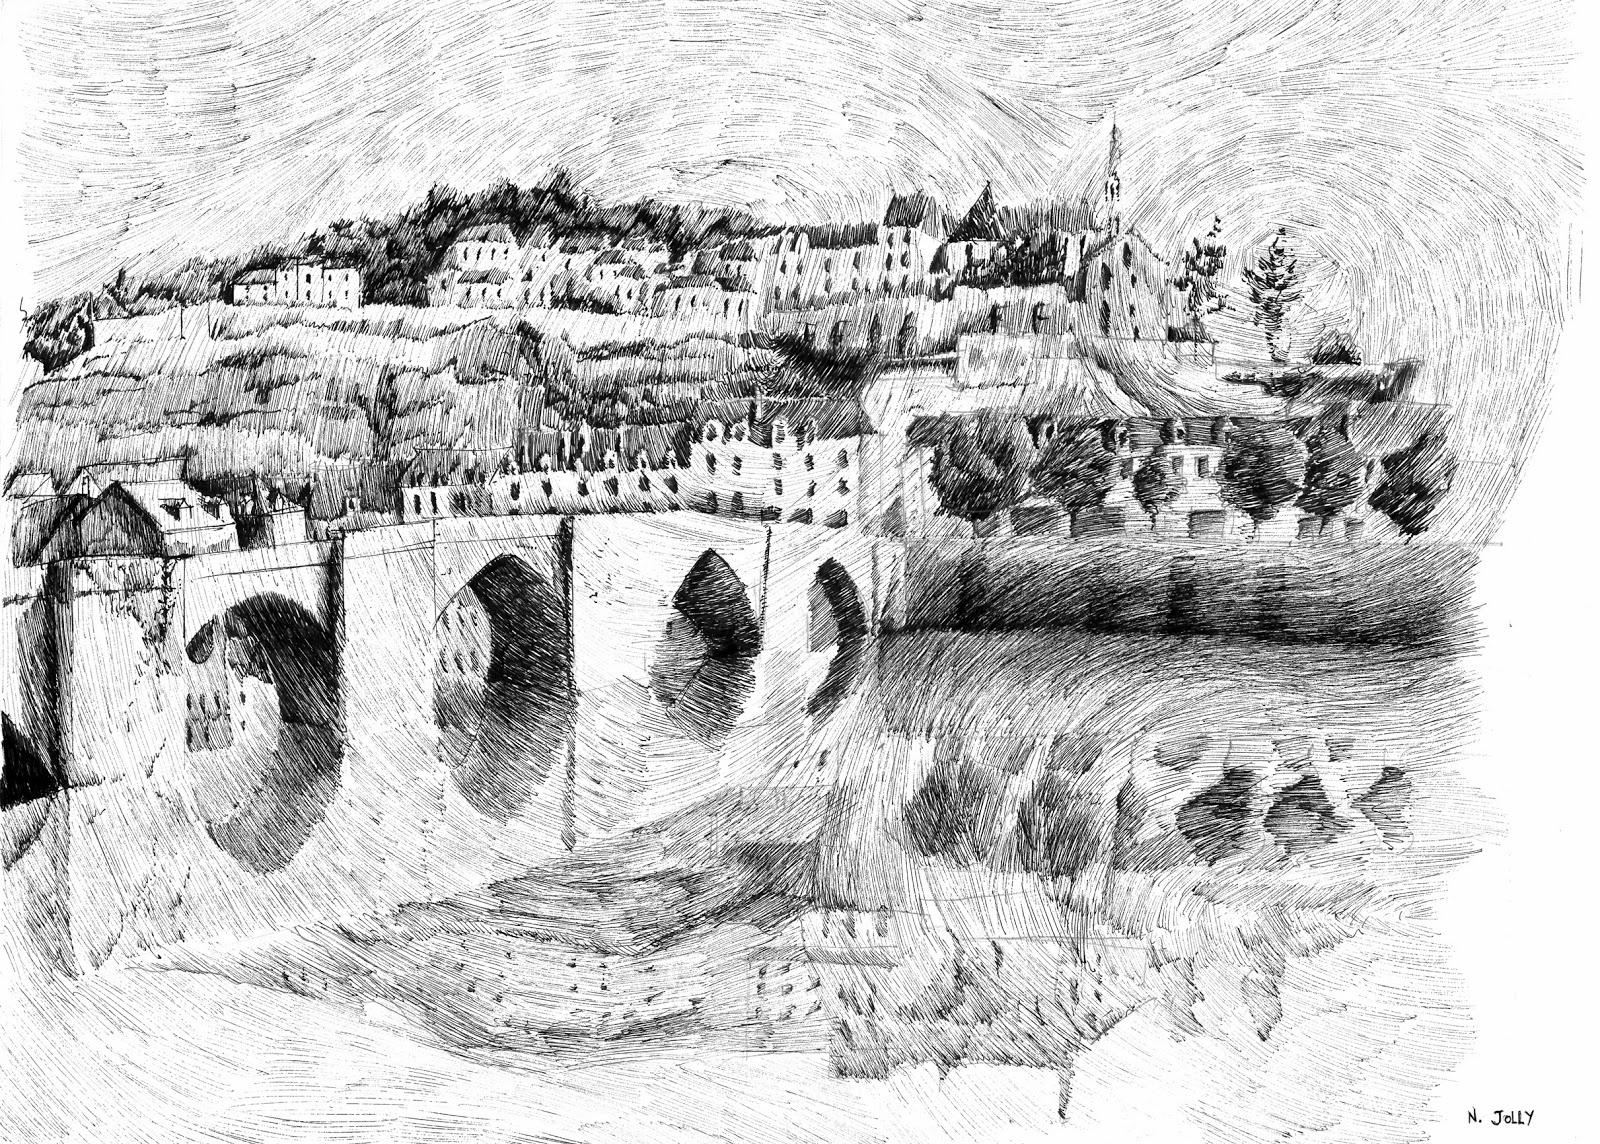 10-Terrasson-Village-French-Nicolas-Jolly-Fingerprints-Black-ink-drawings-www-designstack-co